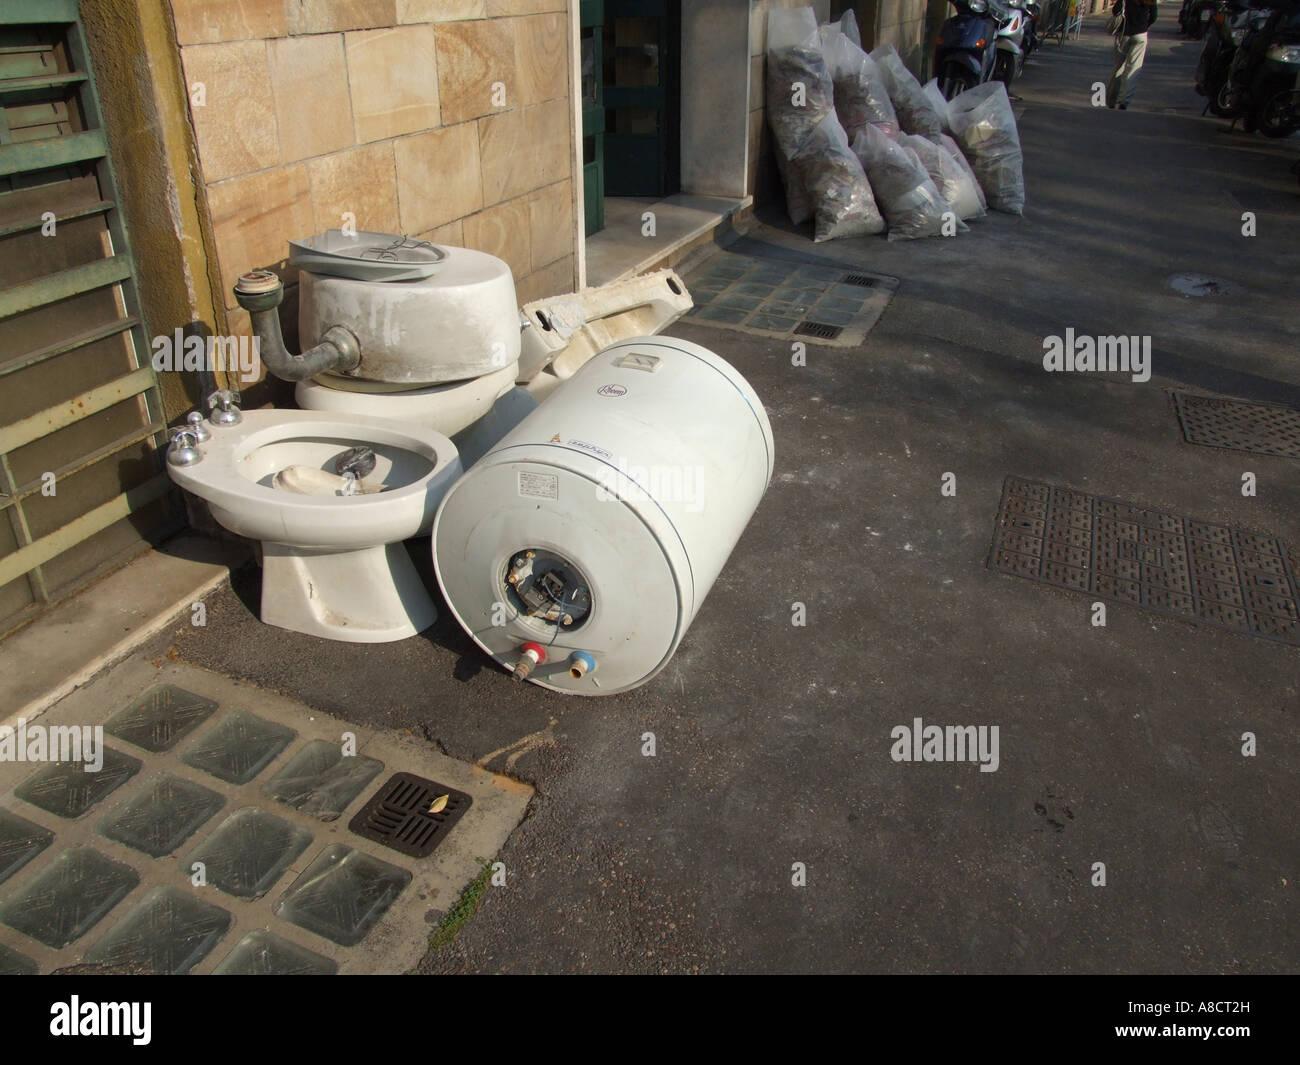 Bidet Funny Stock Photos Bidet Funny Stock Images Alamy